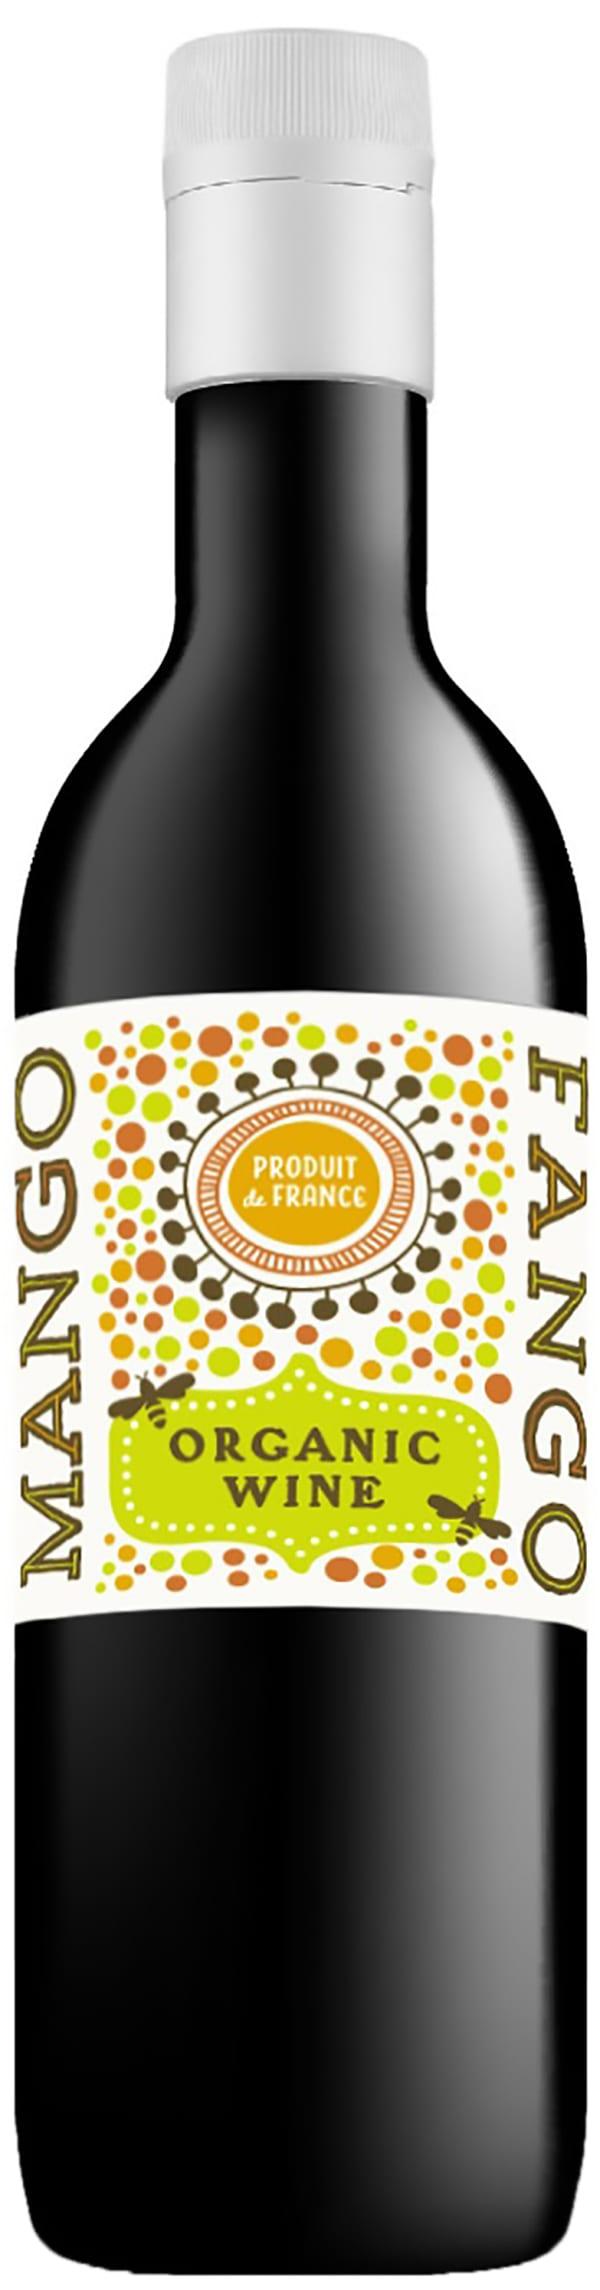 Mango Fango Grenache Syrah Organic 2015 plastic bottle